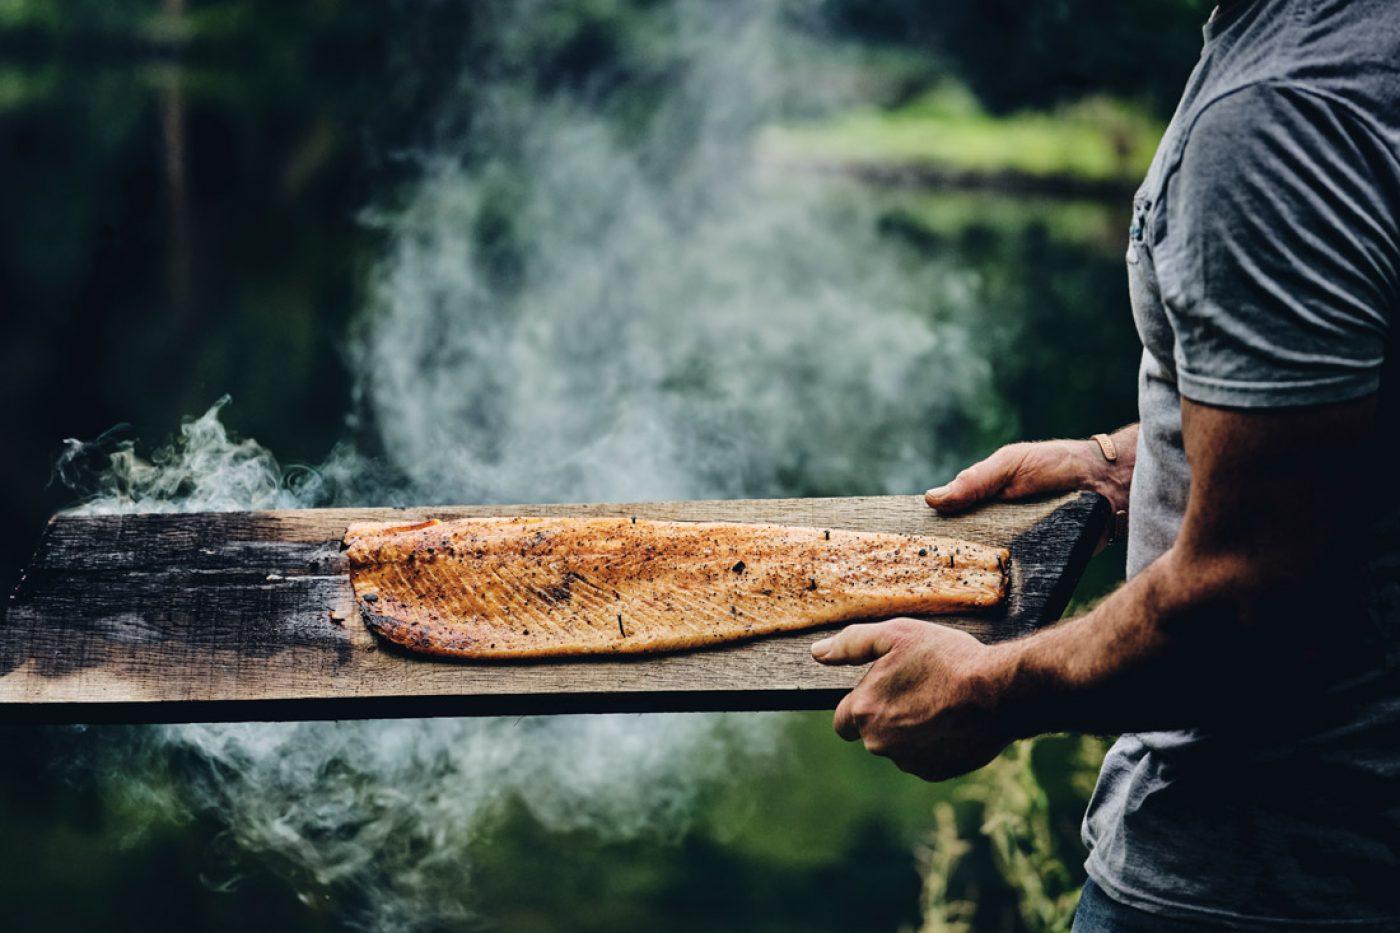 How to hot smoke salmon